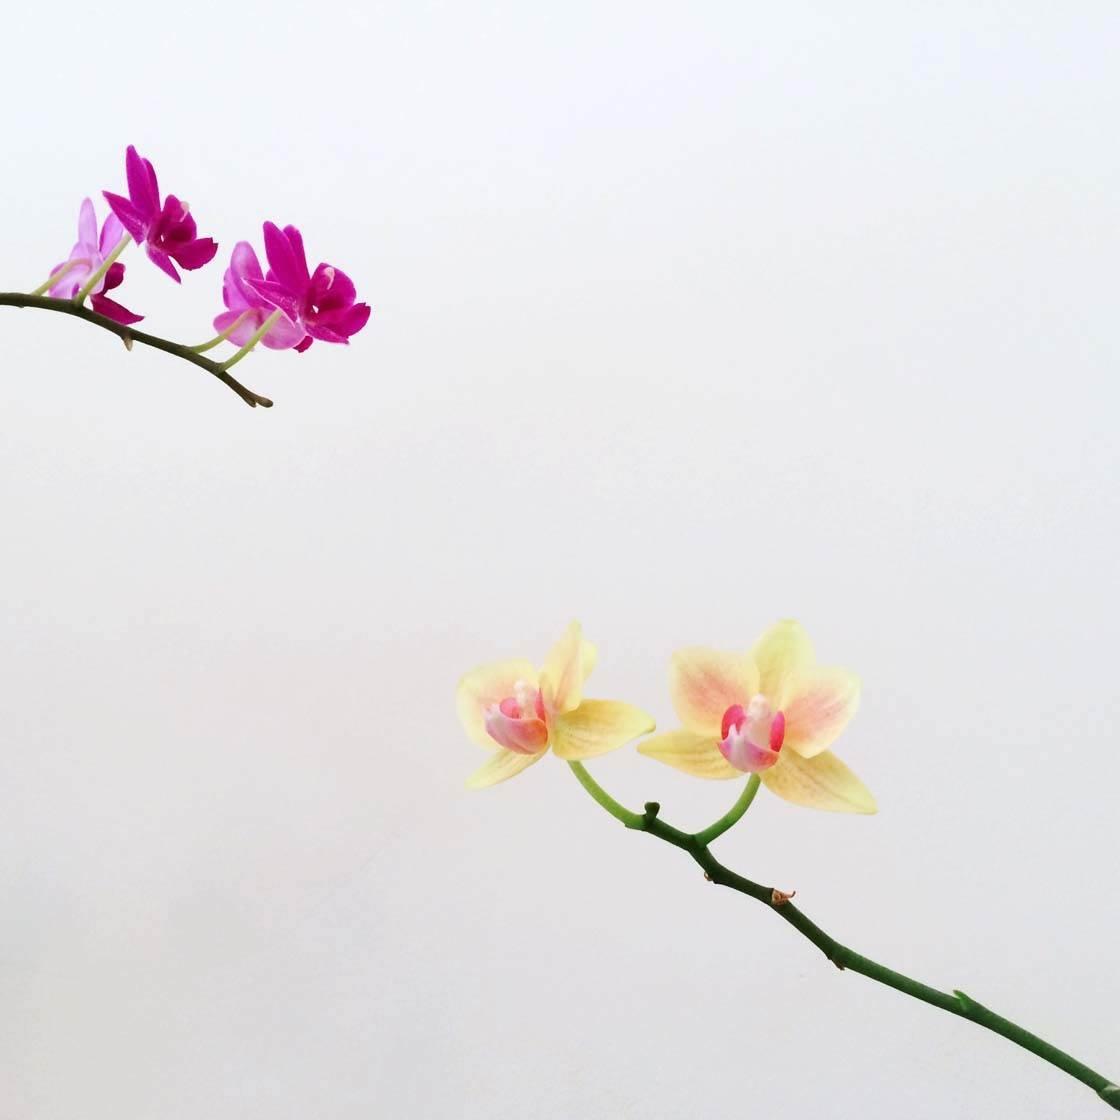 iPhone Flower Photography 43 no script